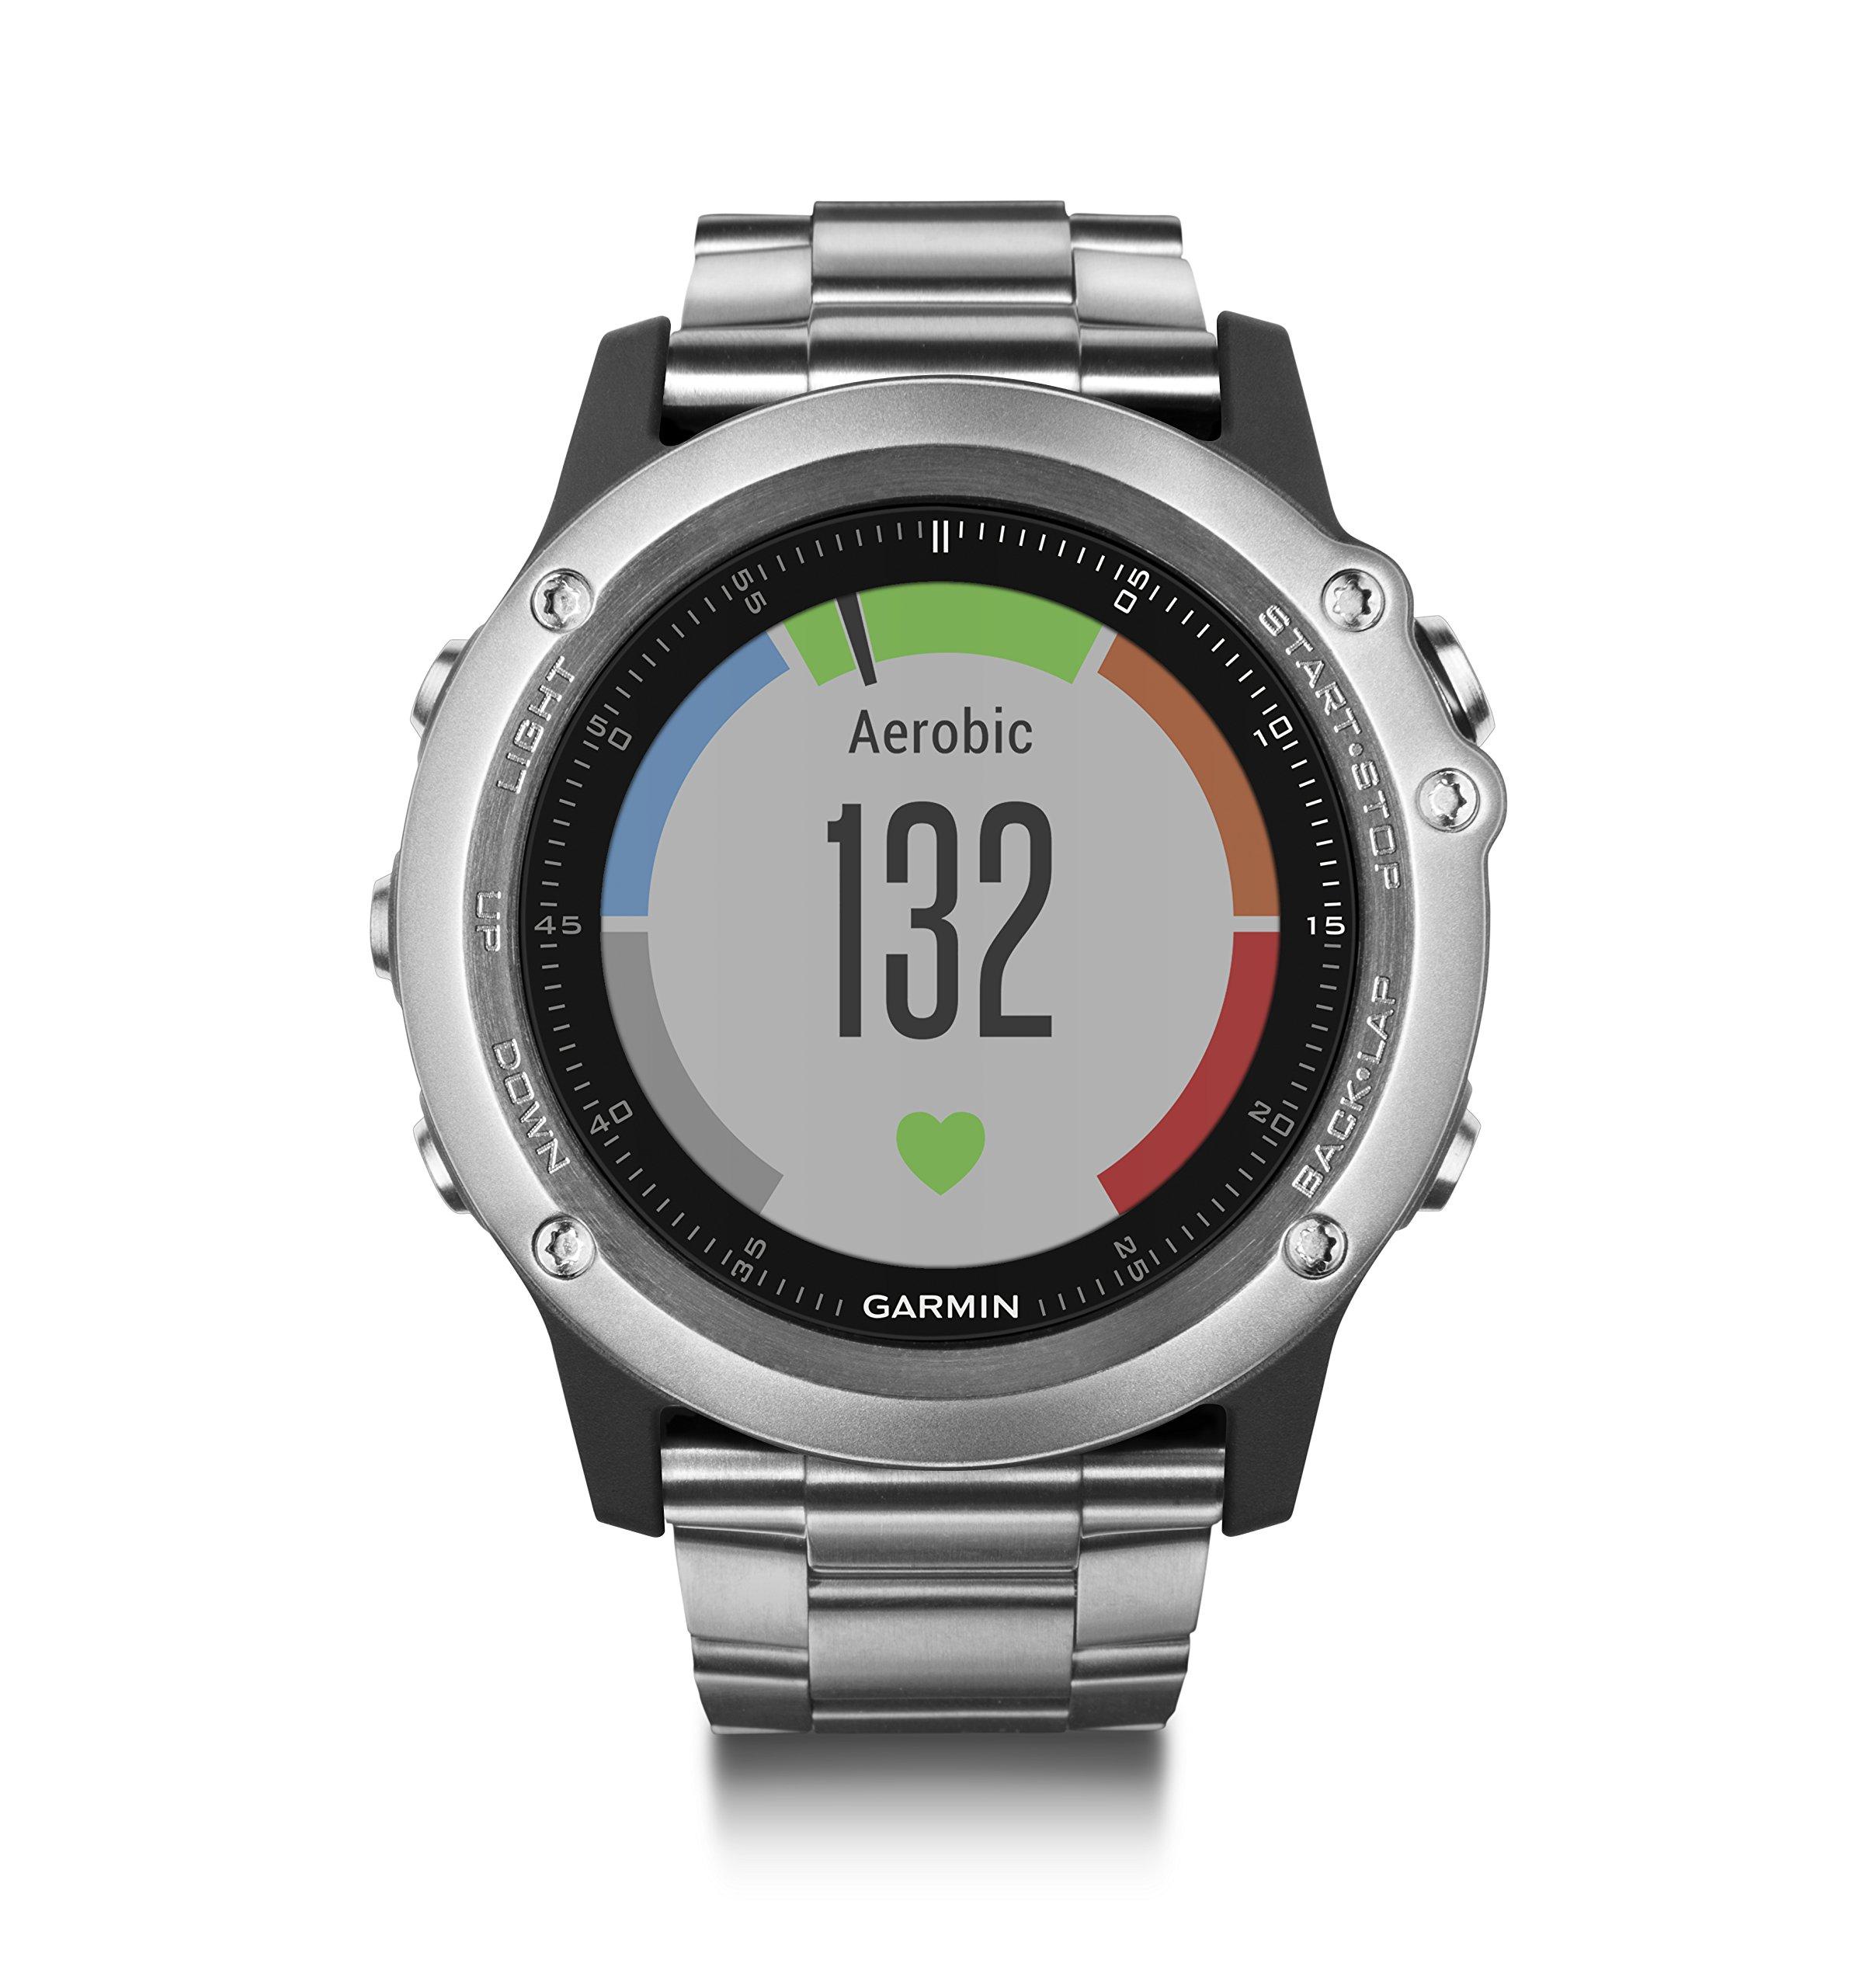 Garmin Fenix 3 HR Smartwatch GPS Multisport, Sensore Cardio al Polso, Display a Colori, Altimetro e Bussola, Nero/Grigio 3 spesavip